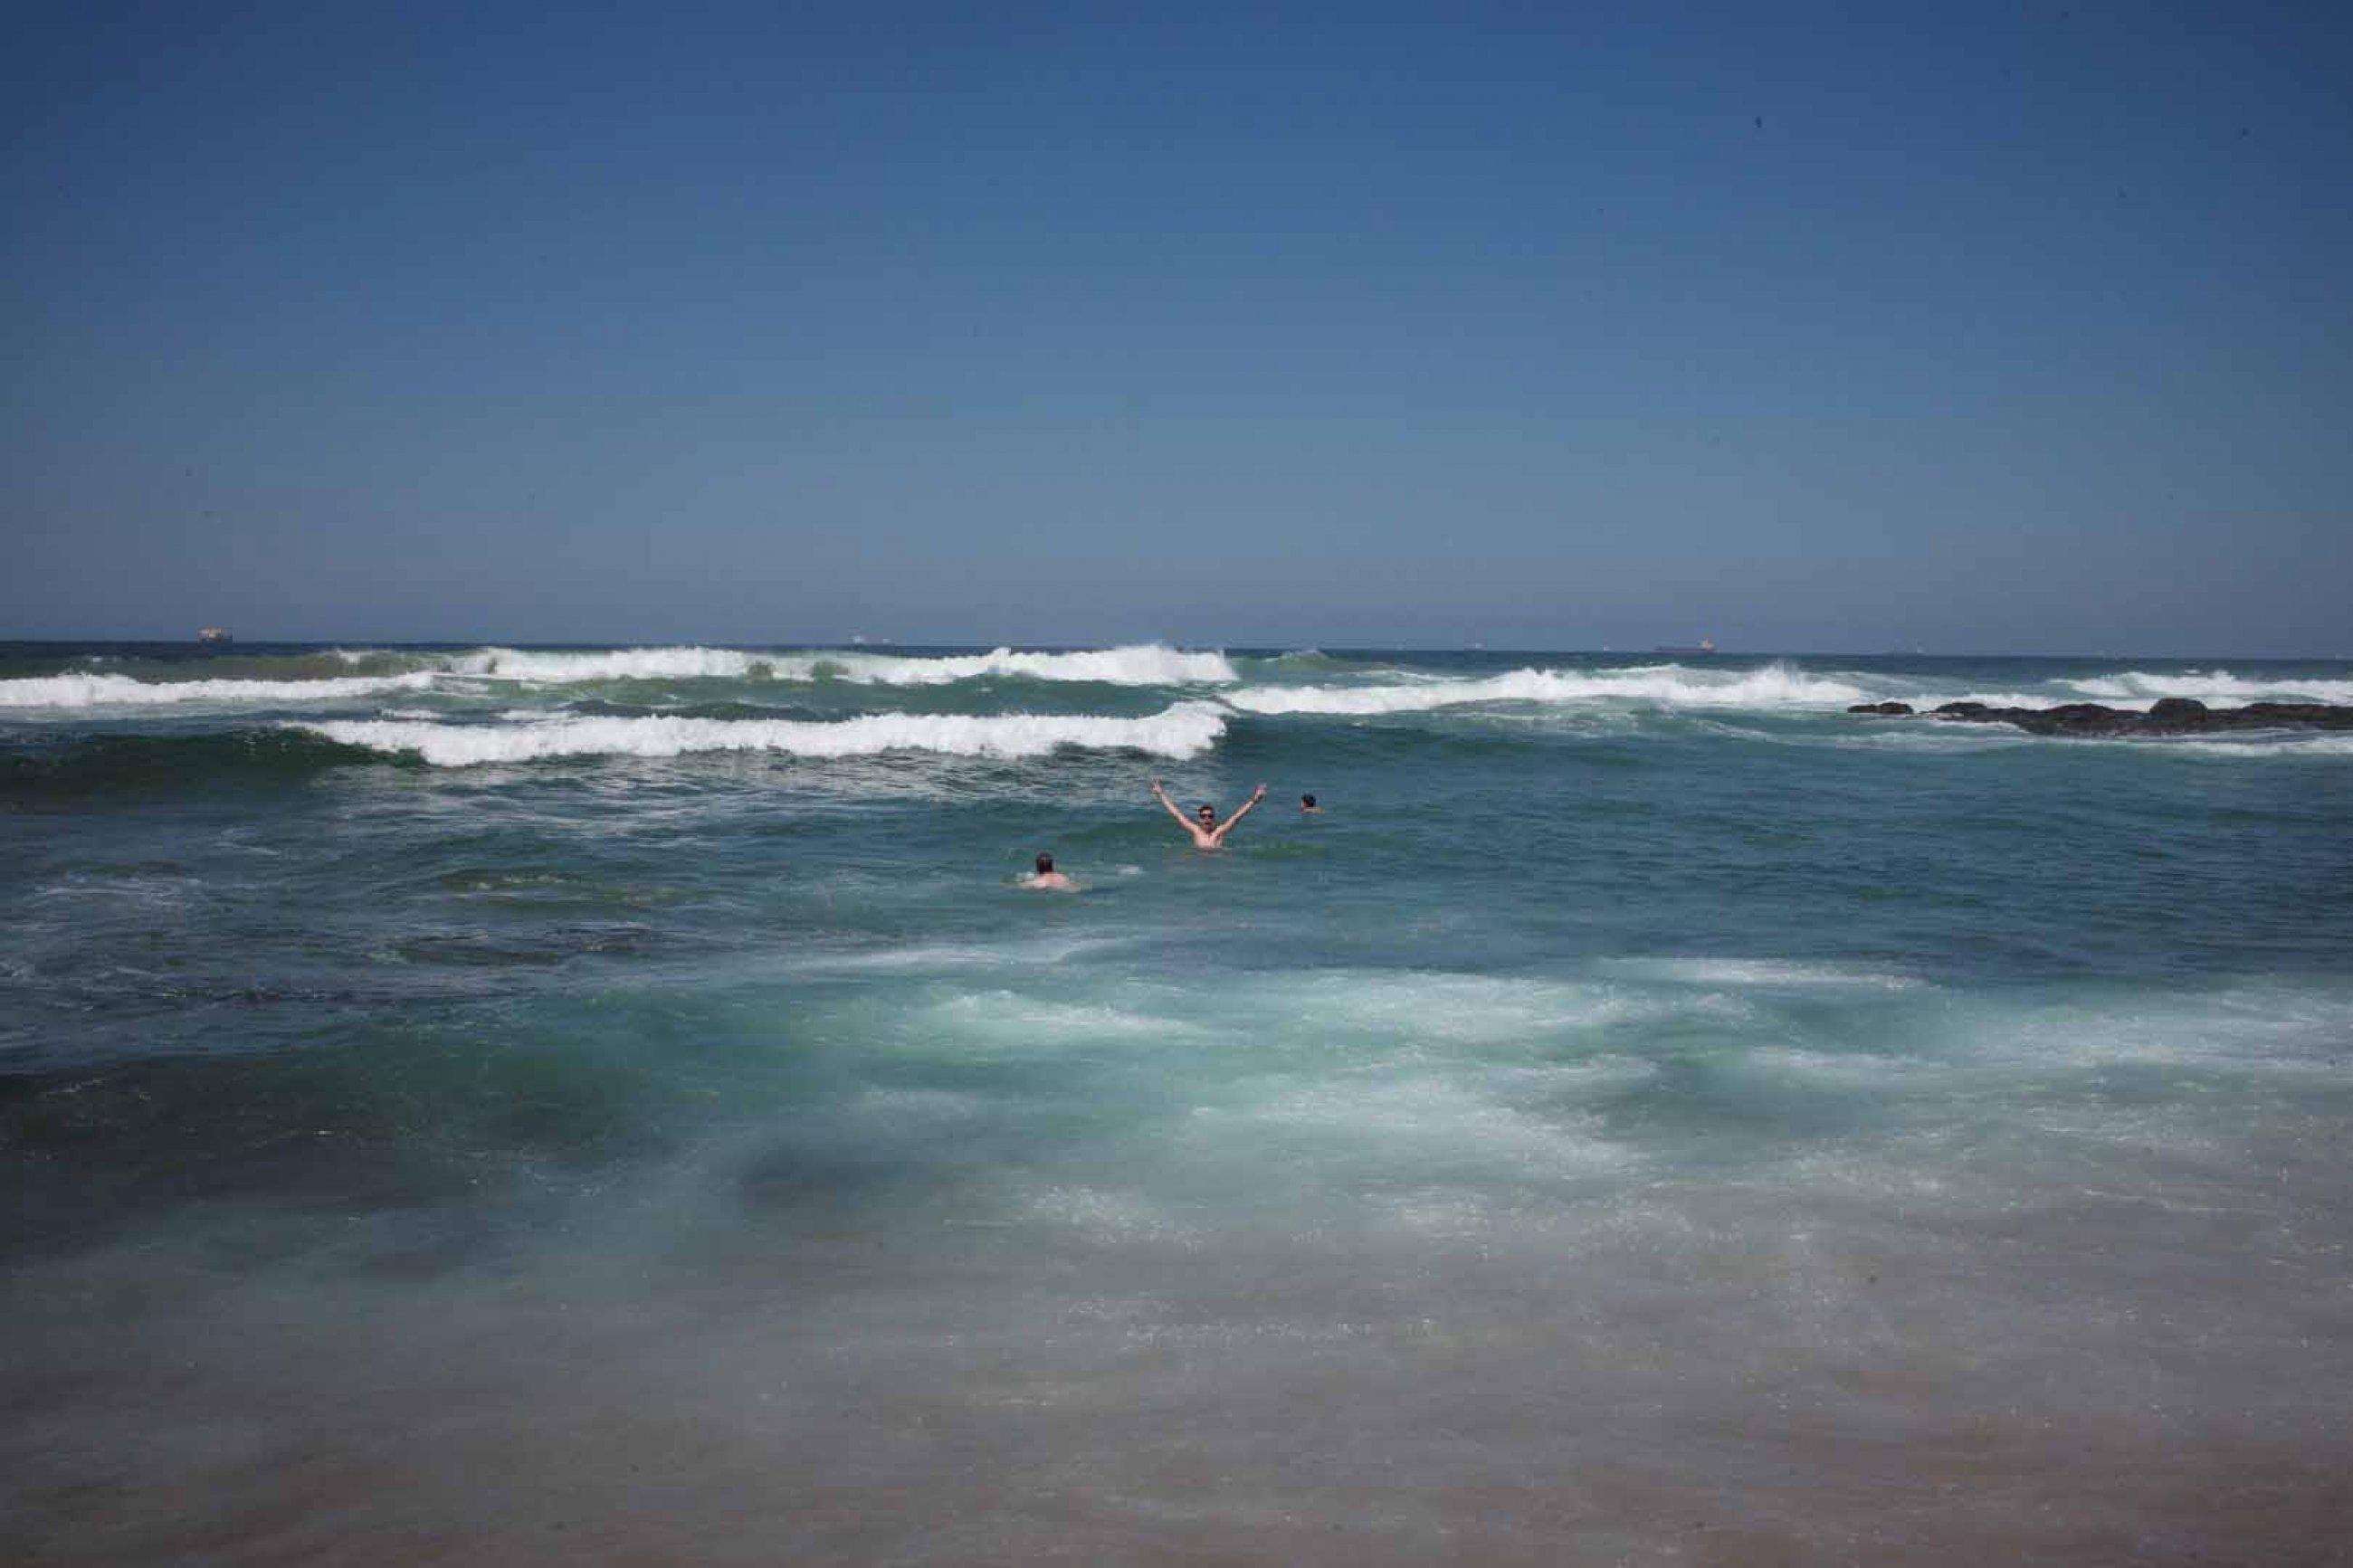 https://bubo.sk/uploads/galleries/7526/3-nebude-sa-nam-pacit.-nadseny-dando-vo-vodach-indickeho-oceanu.jpg